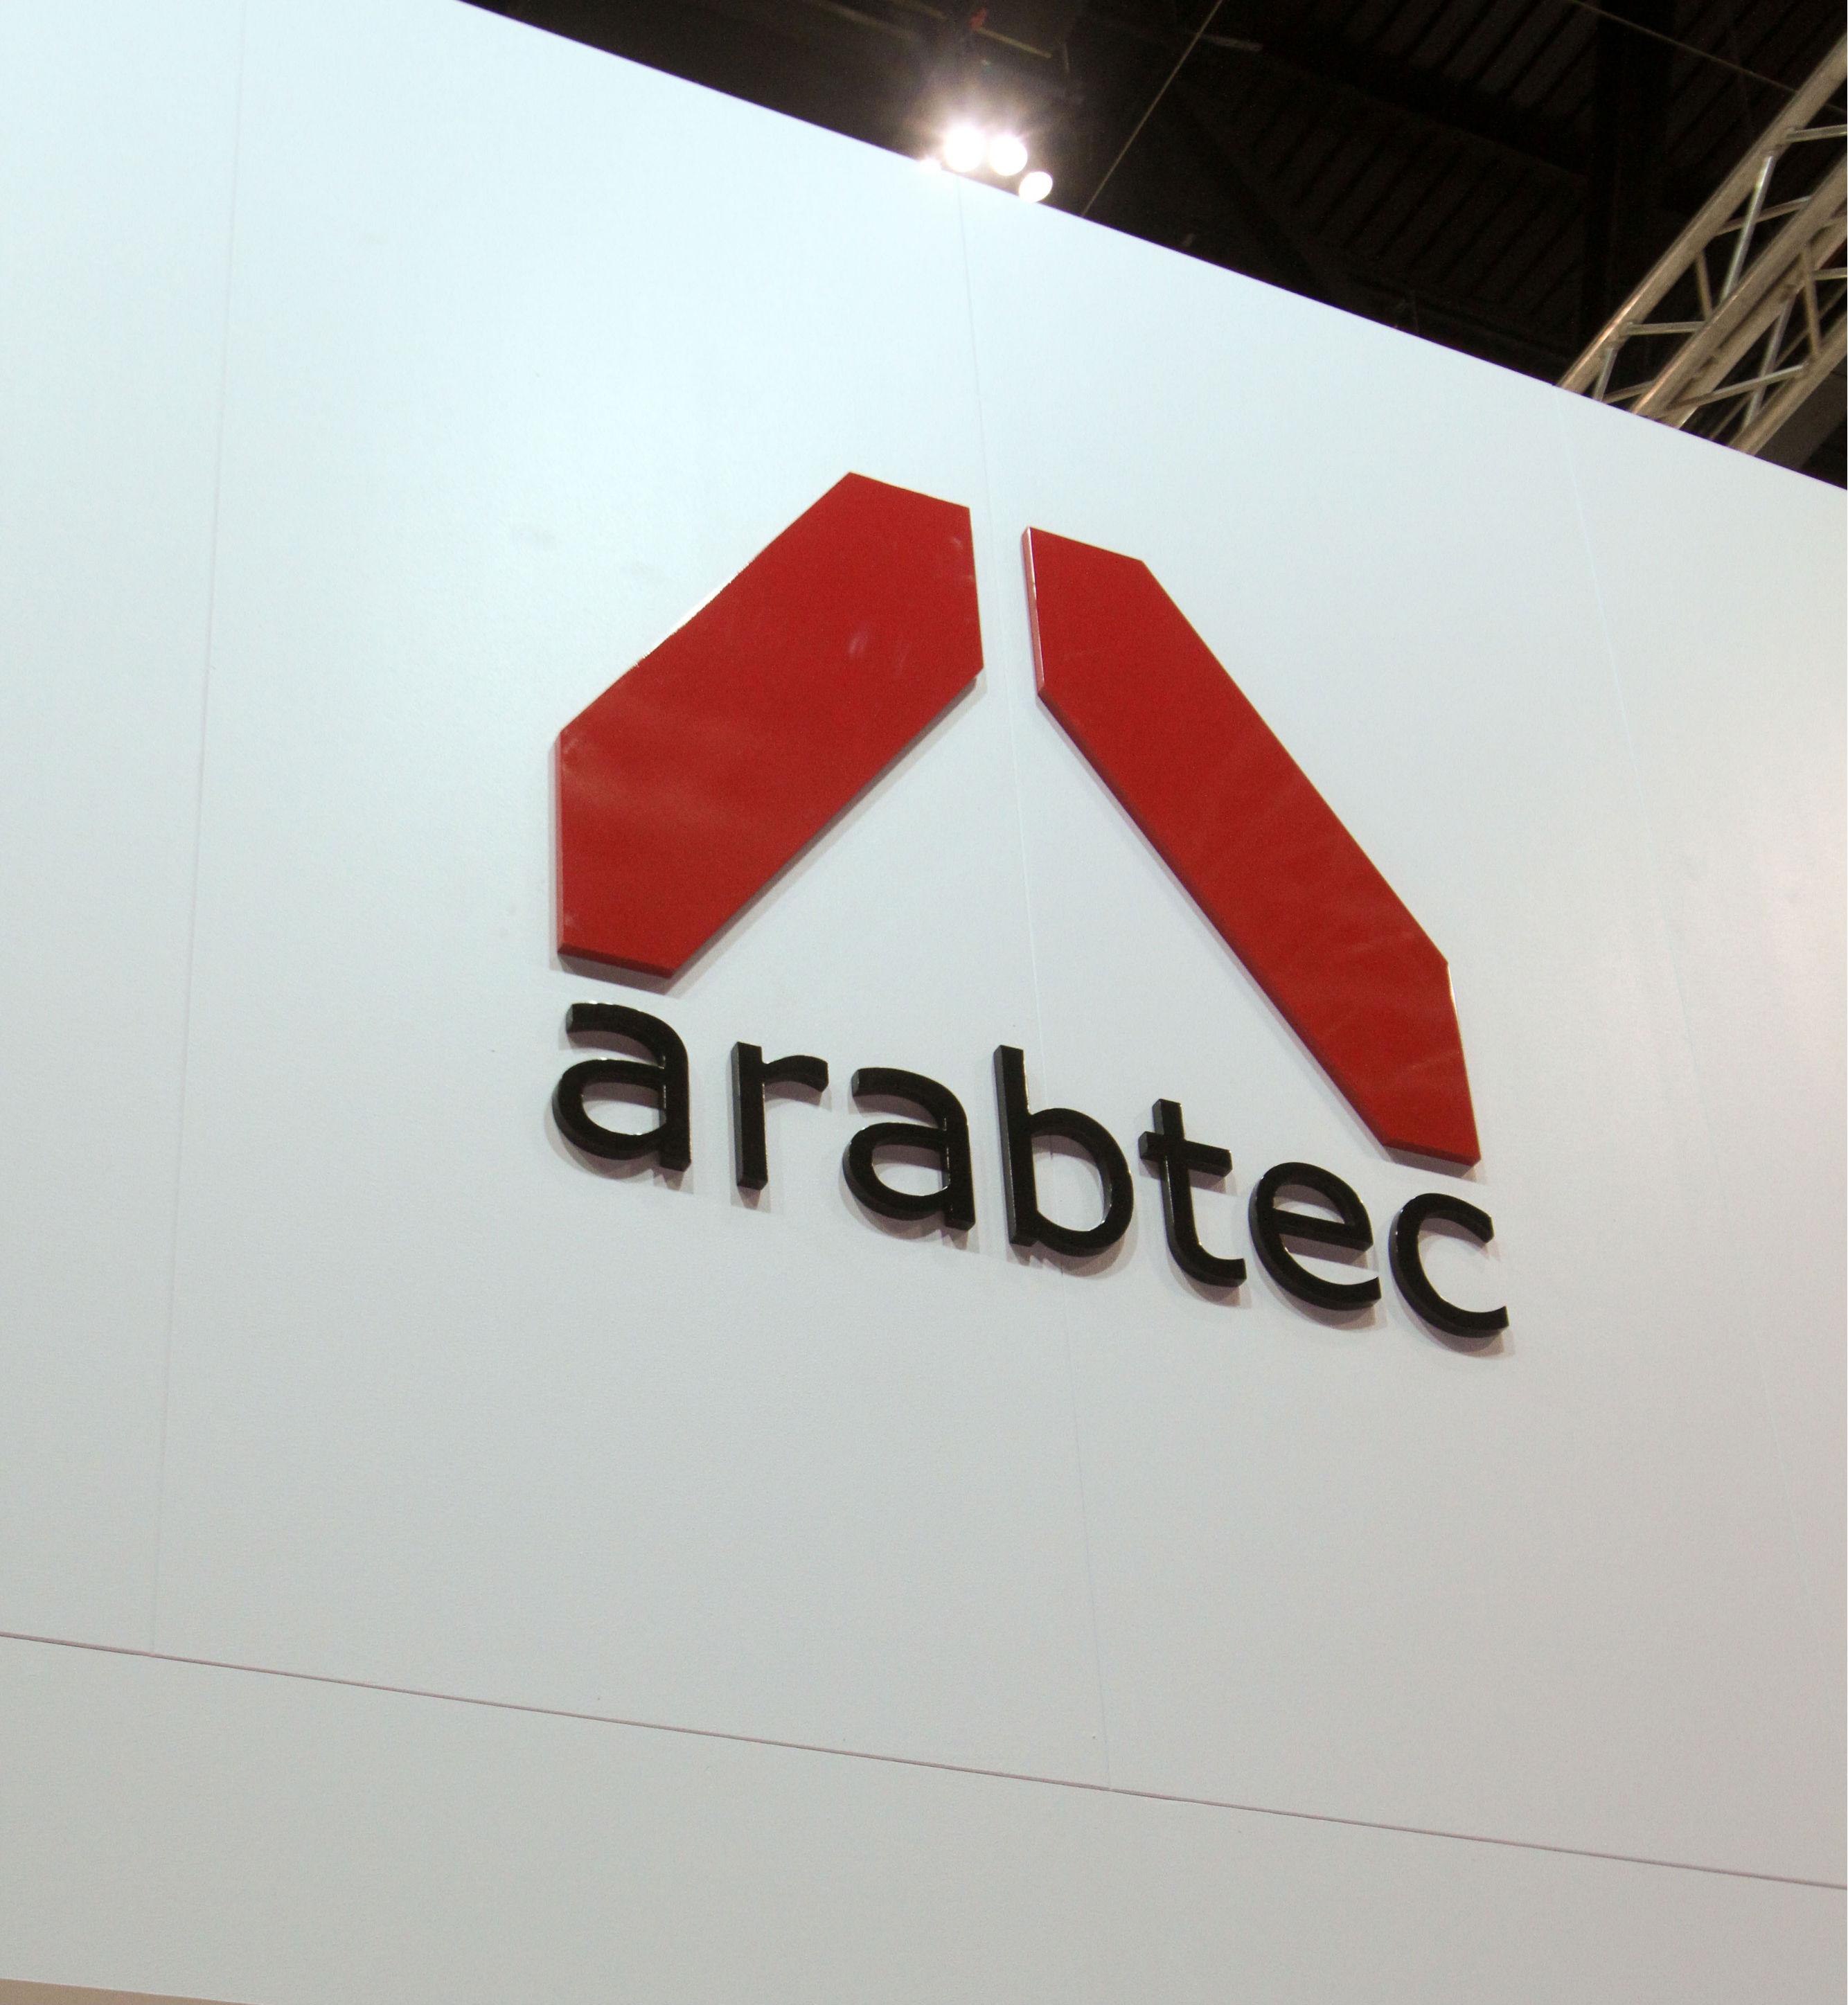 Dubai's Arabtec Says Appoints CEO For Its Construction Unit